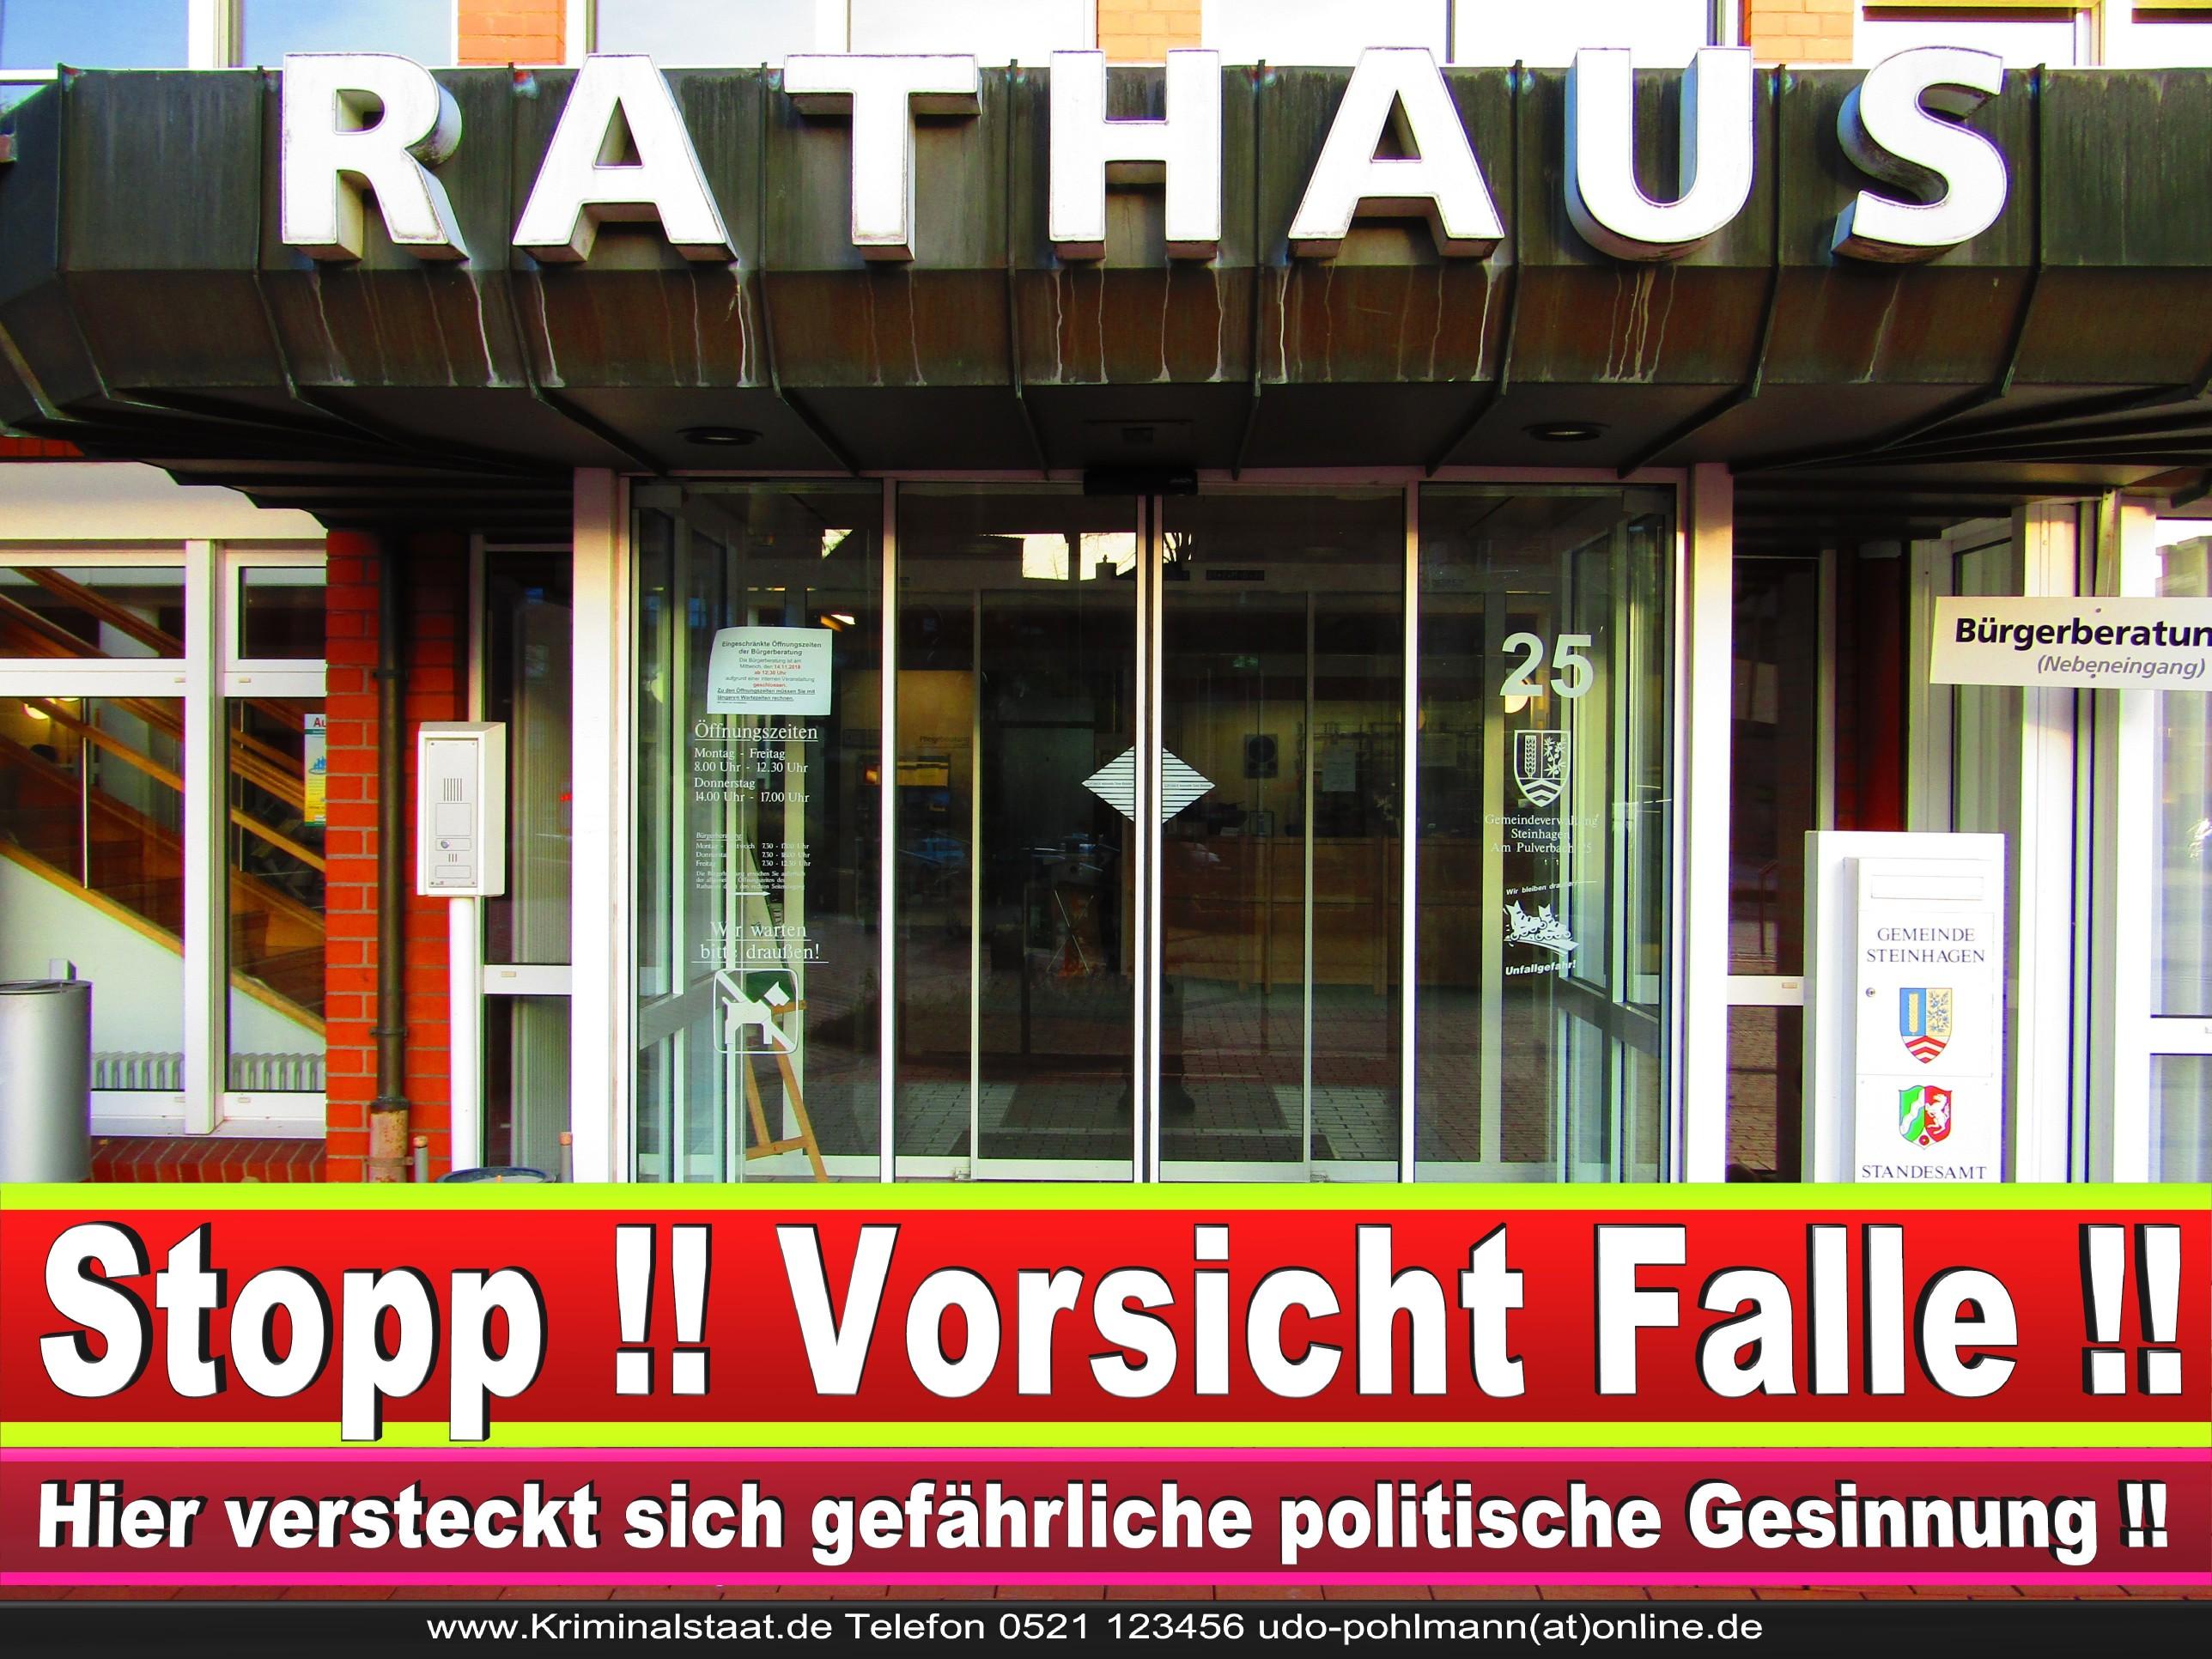 Rathaus Steinhagen CDU SPD FDP Ortsverband CDU Bürgerbüro CDU SPD Korruption Polizei Bürgermeister Karte Telefonbuch NRW OWL (1)